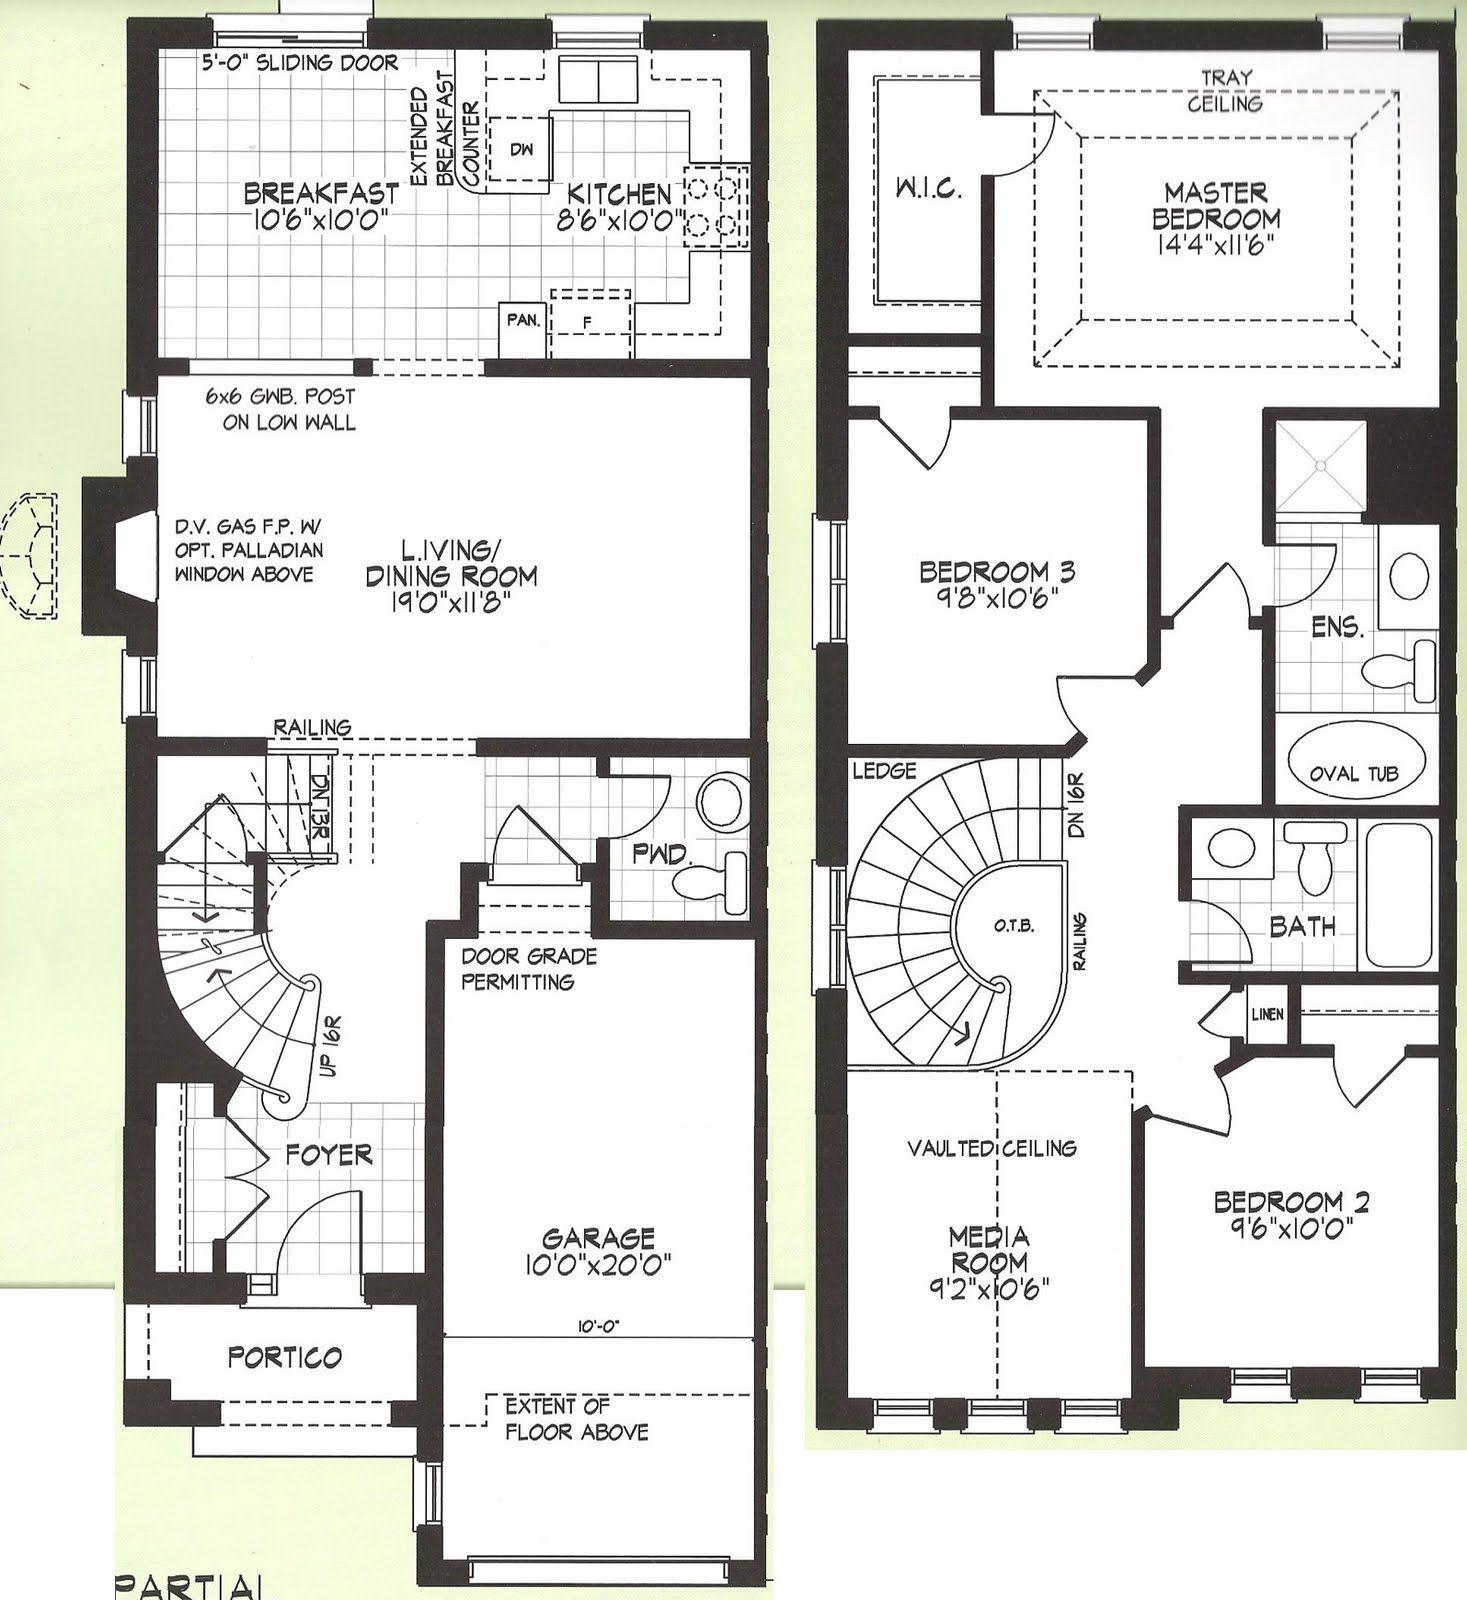 Eames House Floor Plan Dimensions Apartment Interior Design Hotel Floor Plan Mansion Floor Plan Eames House